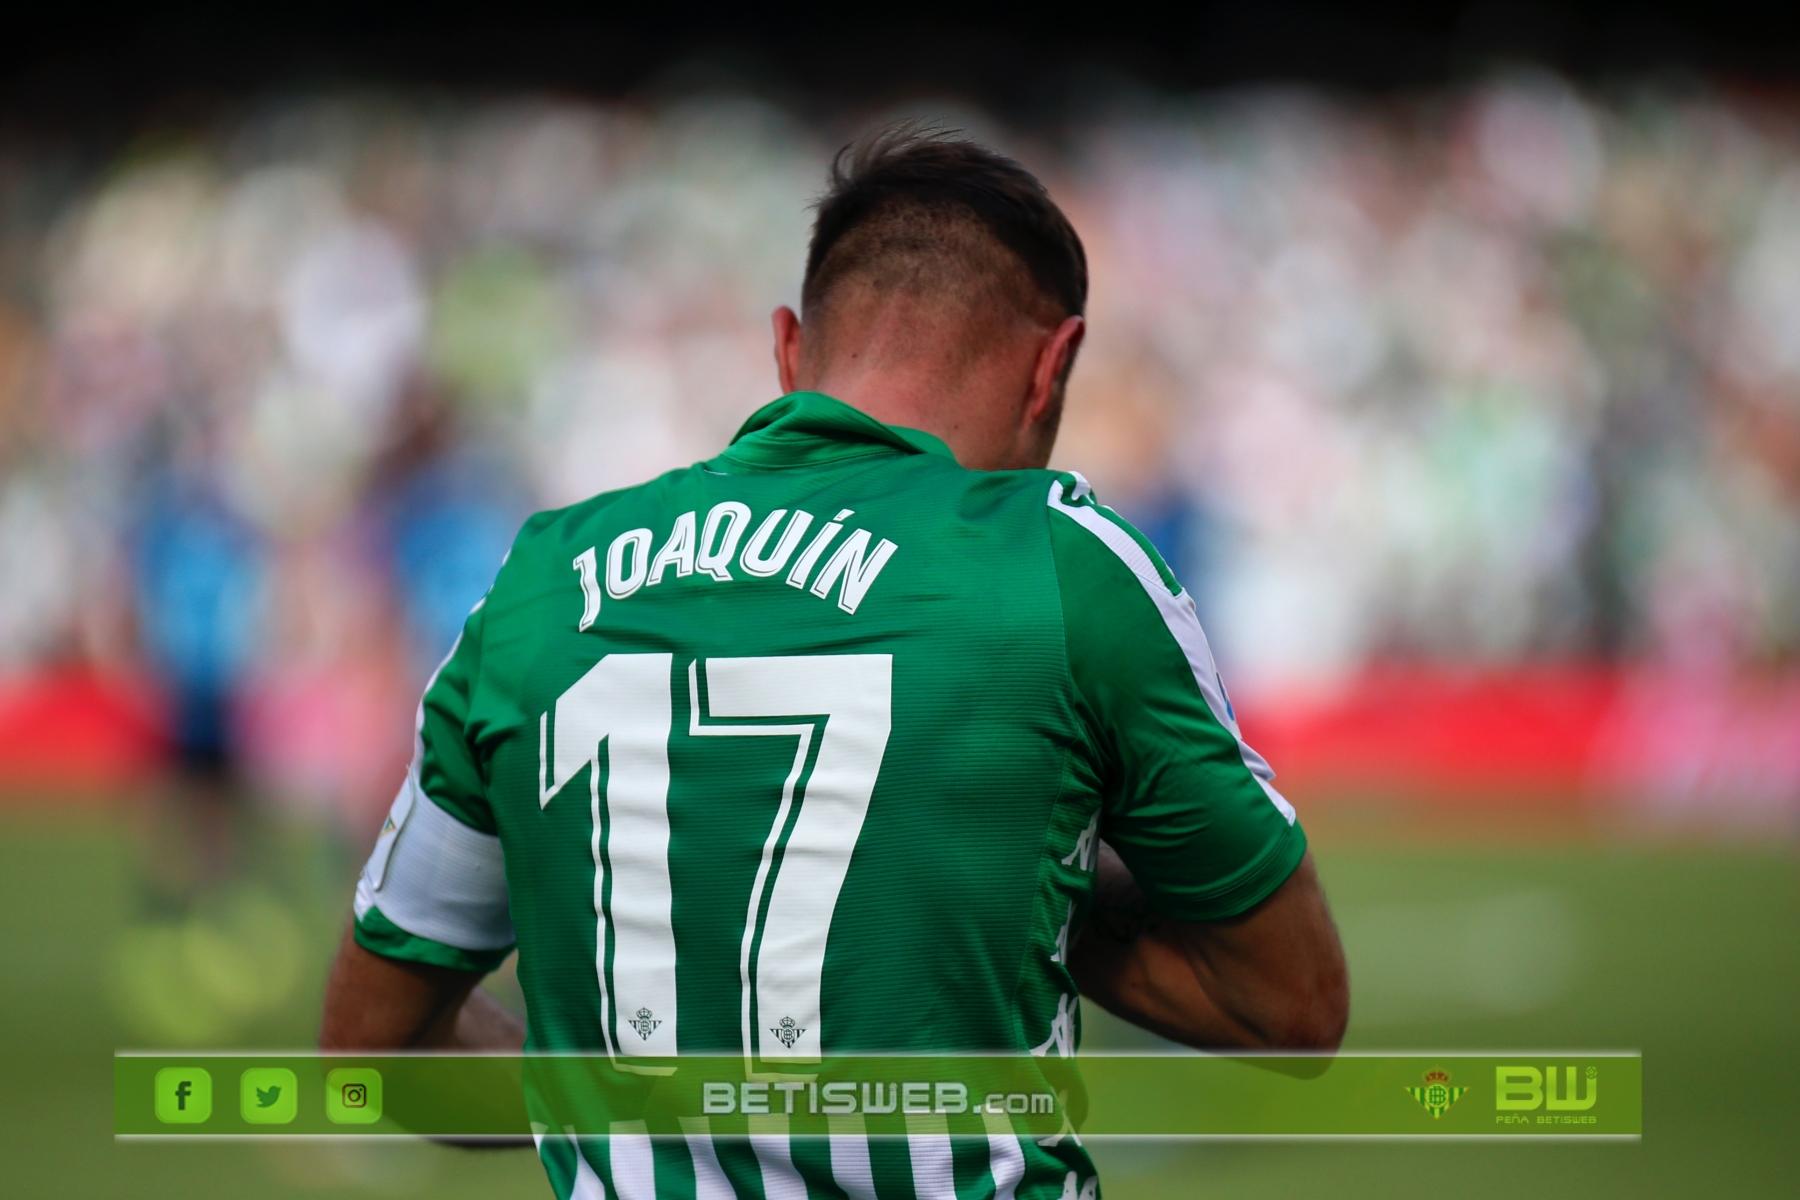 aJ20 Real Betis - Real Sociedad 35